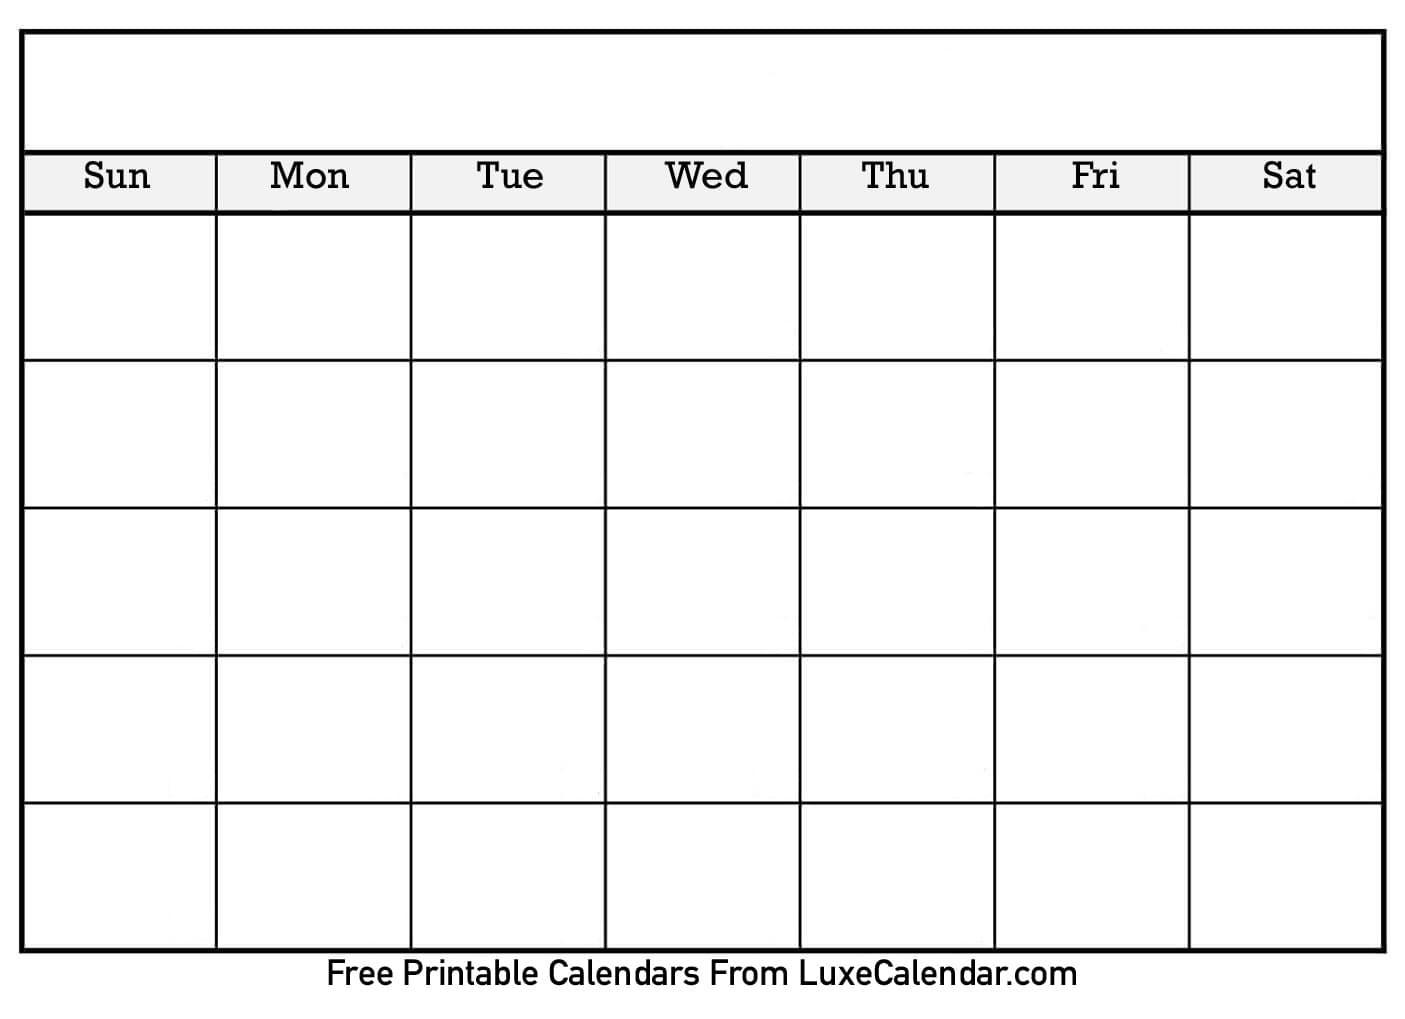 Blank Printable Calendar - Luxe Calendar  Full Page Blank Month Calendar